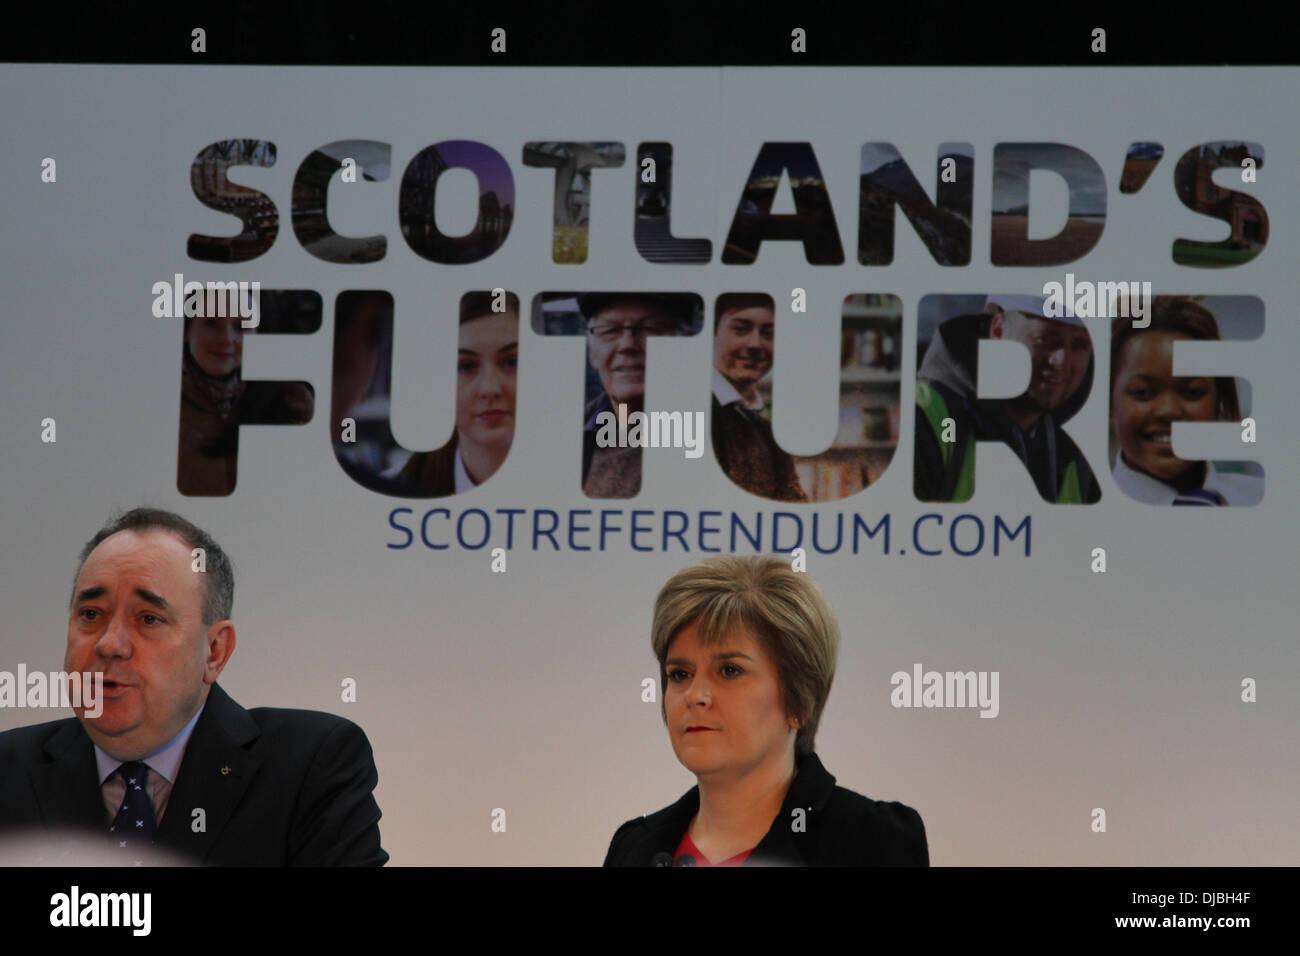 Glasgow, Scotland. 26th Nov, 2013. Scotland's First Minister Alex Salmond (L) and Deputy First Minister Nicola Sturgeon Stock Photo